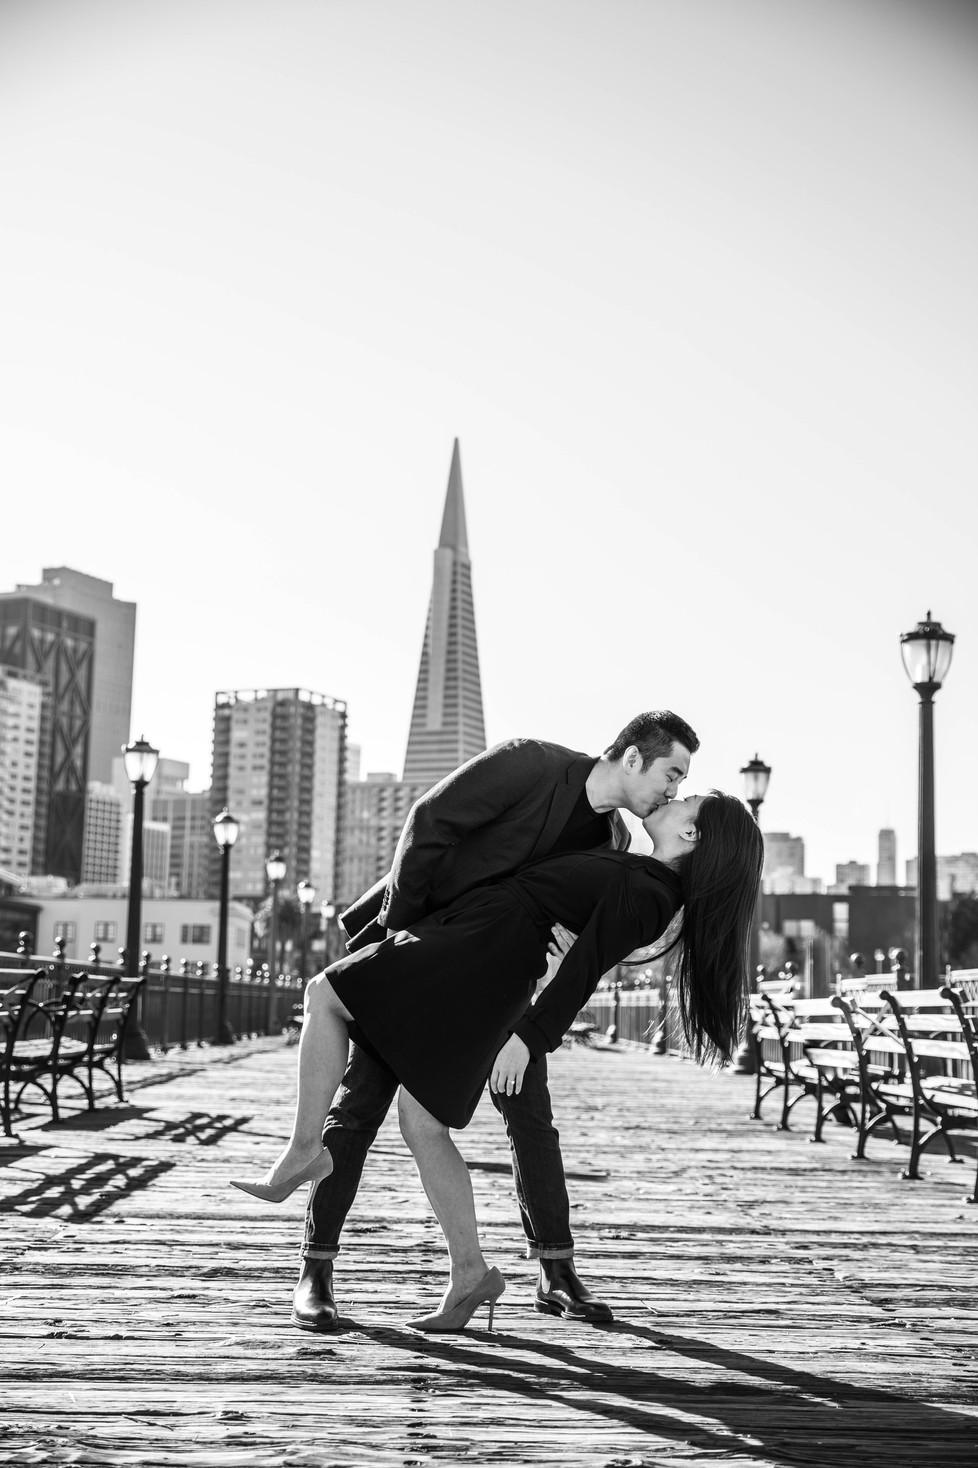 SF Pier7 Proposal Photoshoot